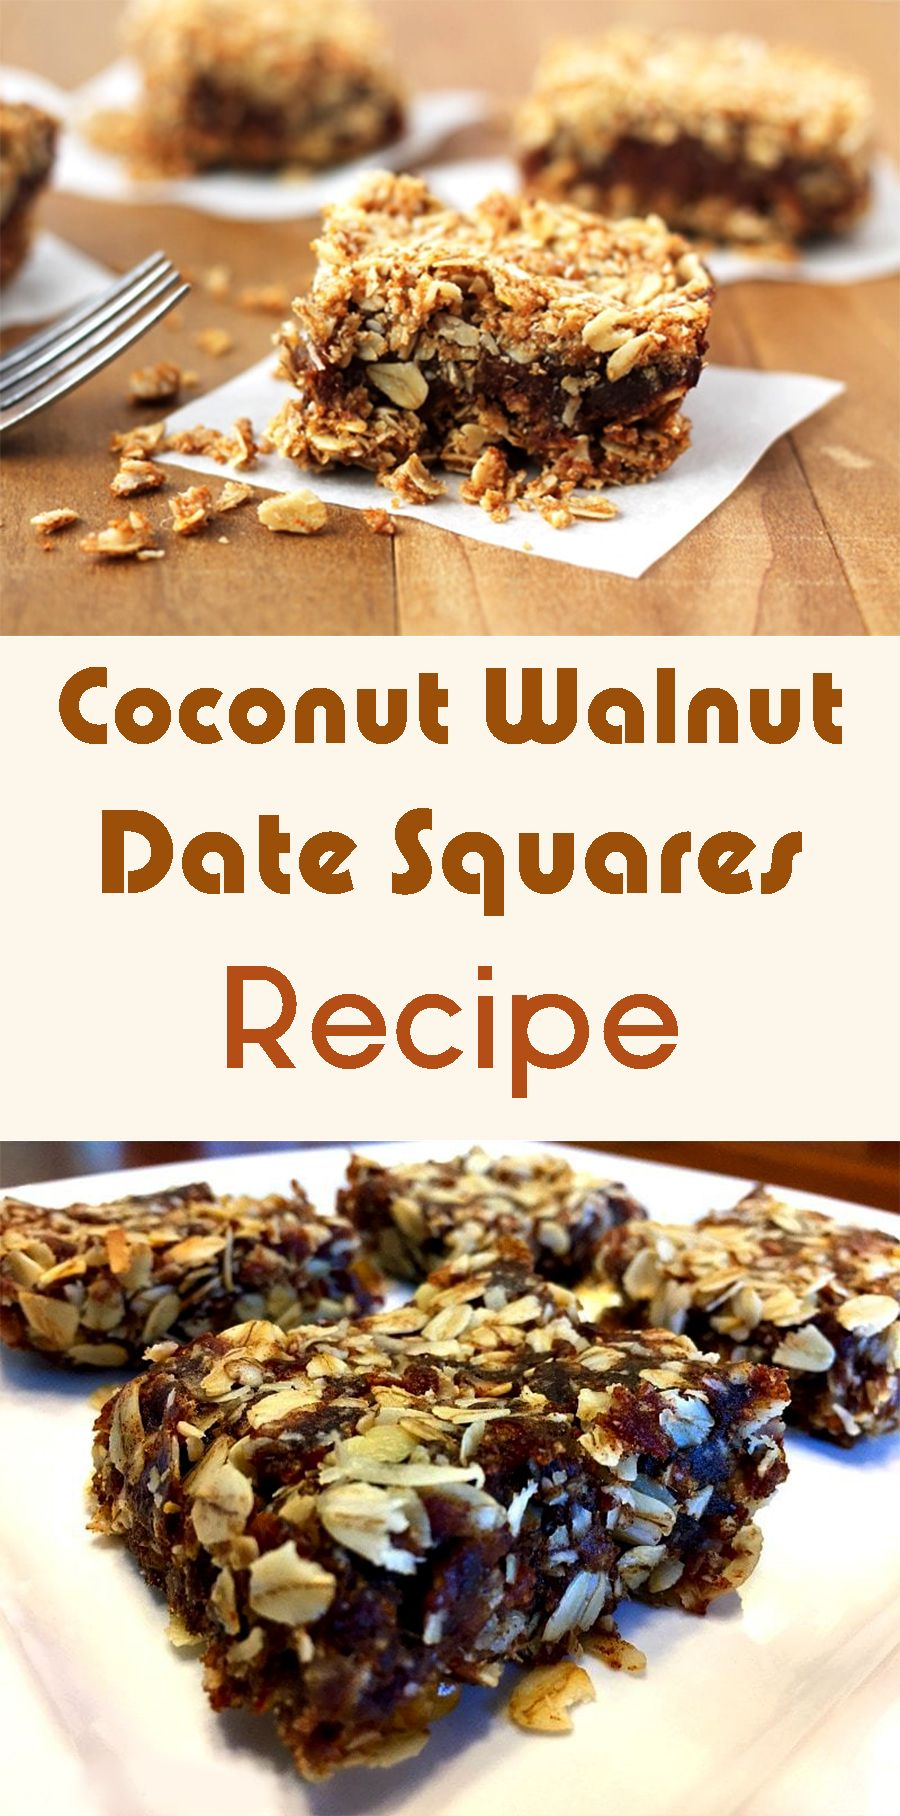 Coconut Walnut Date Squares Recipe